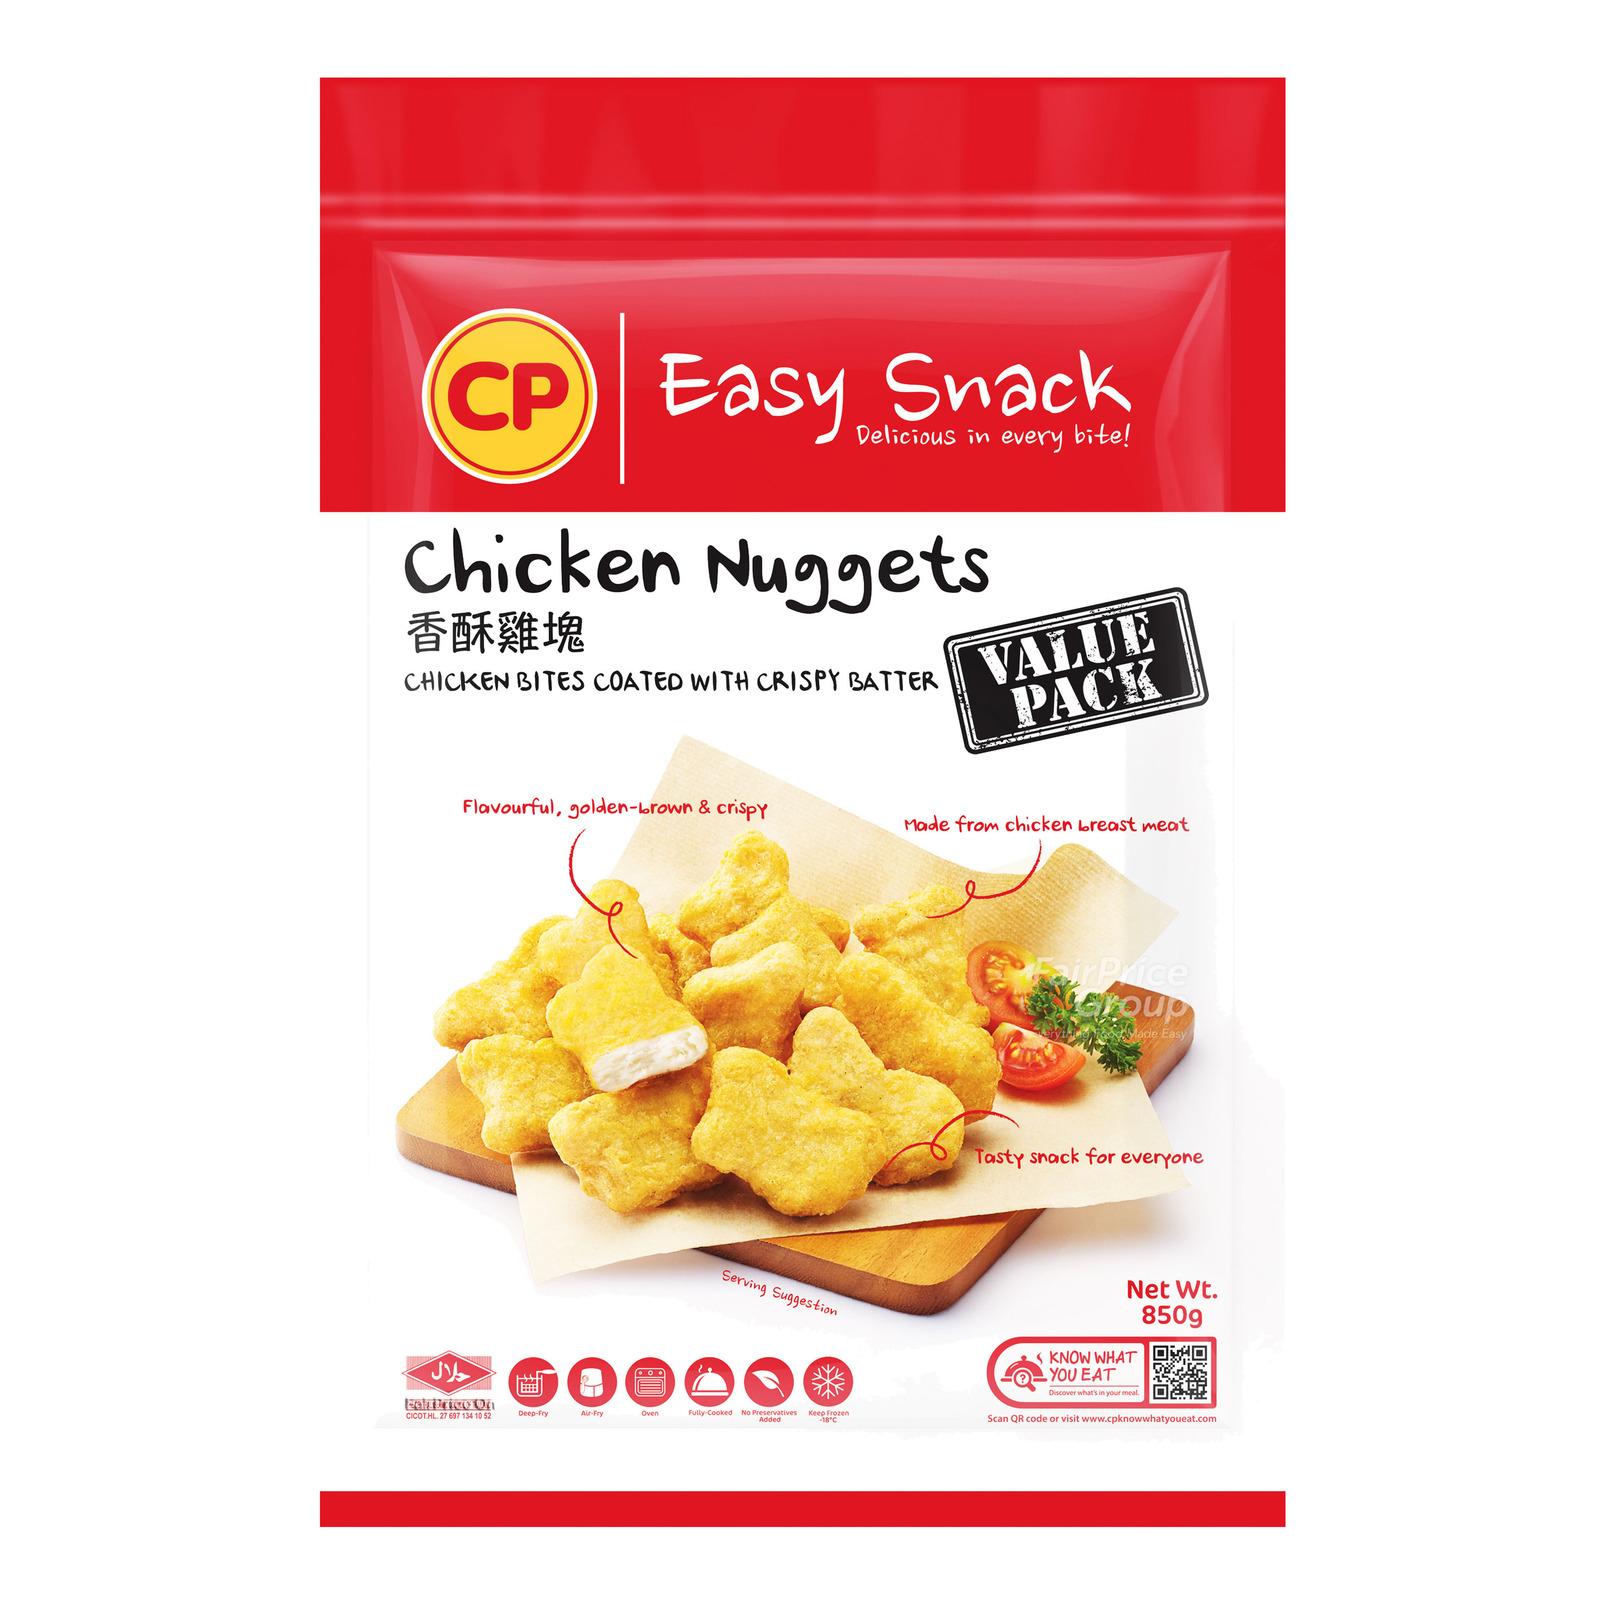 CP Easy Snack - Crispy Chicken Nuggets